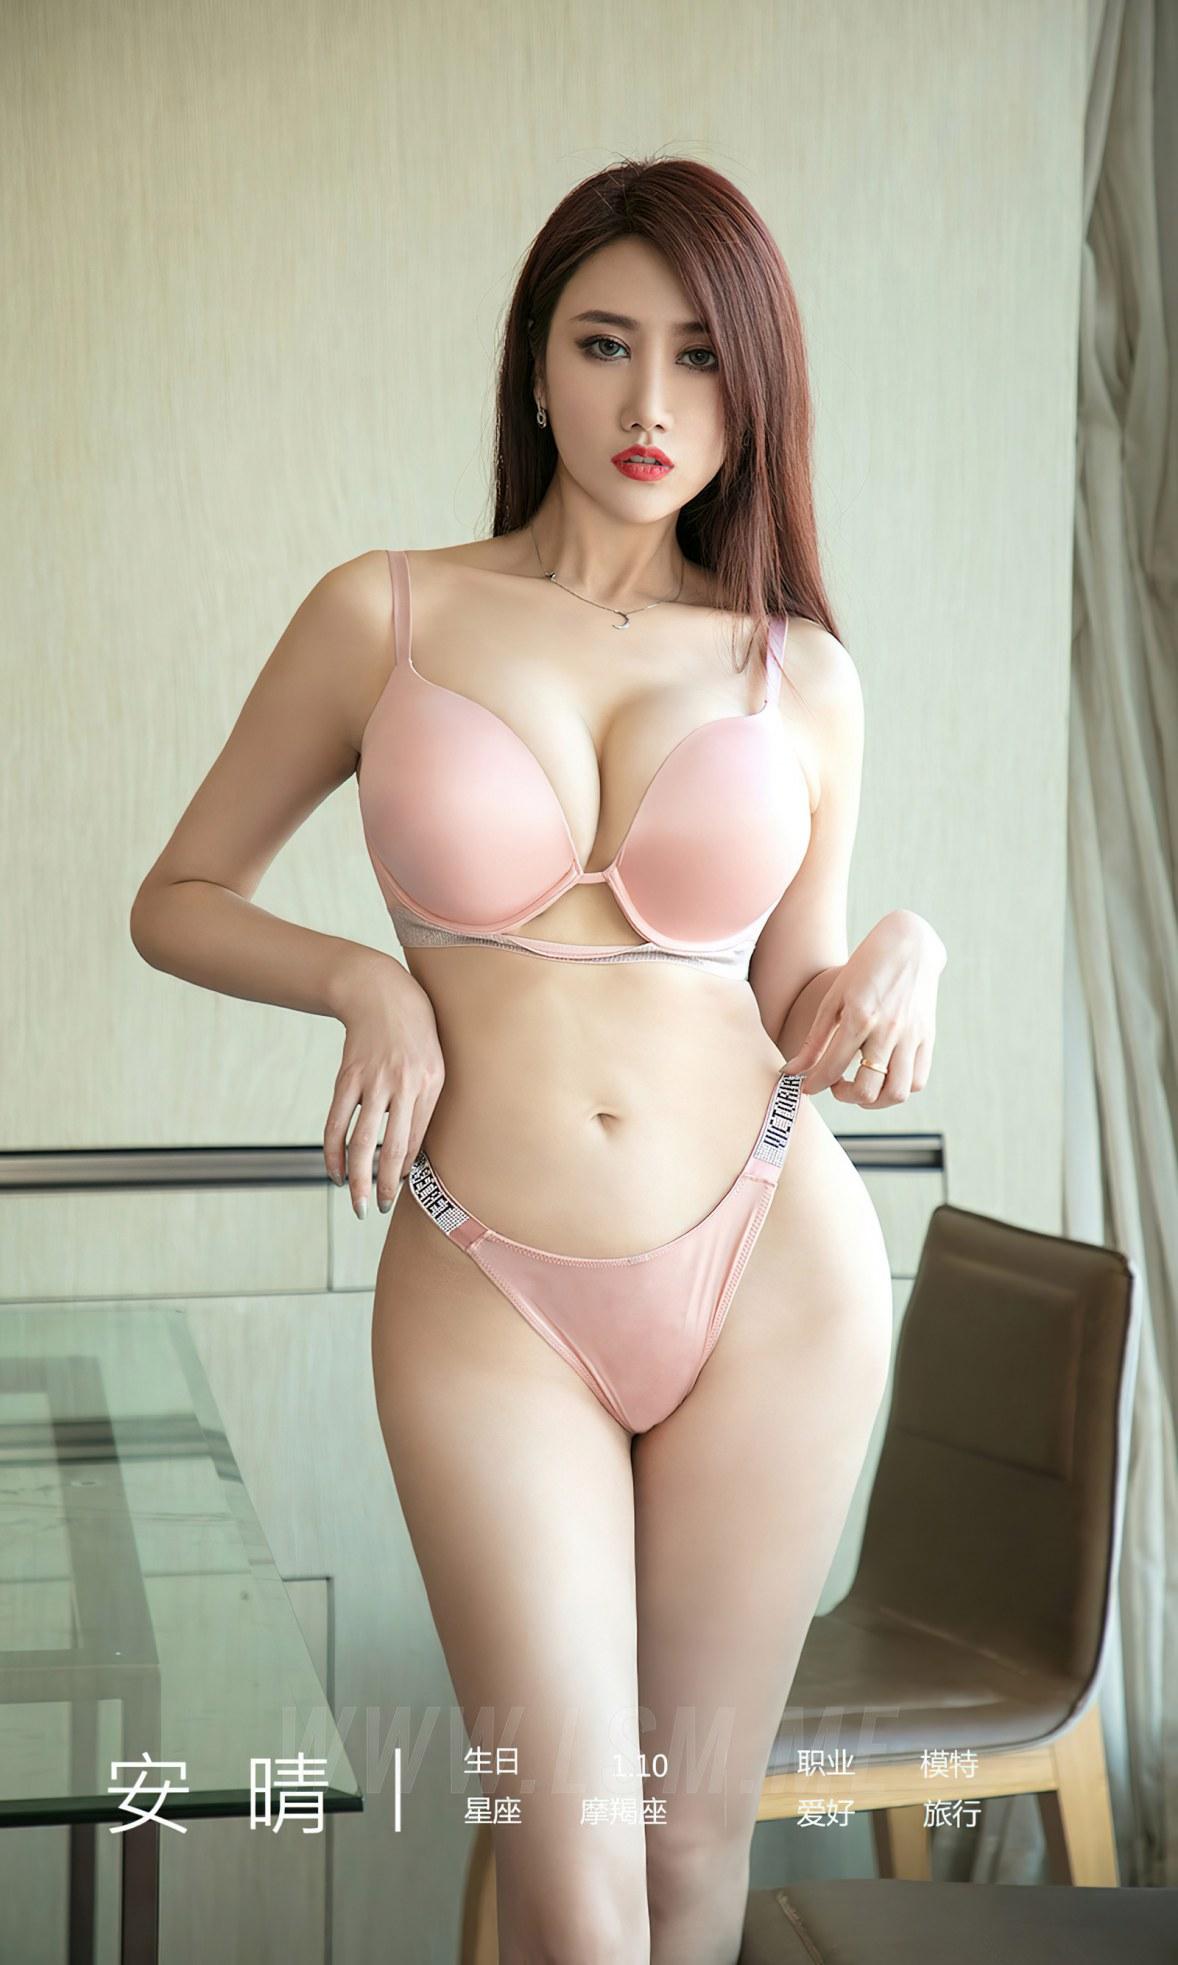 UGirls 爱尤物 No.2025 安晴 美模max 粉色内衣爆乳 - 4